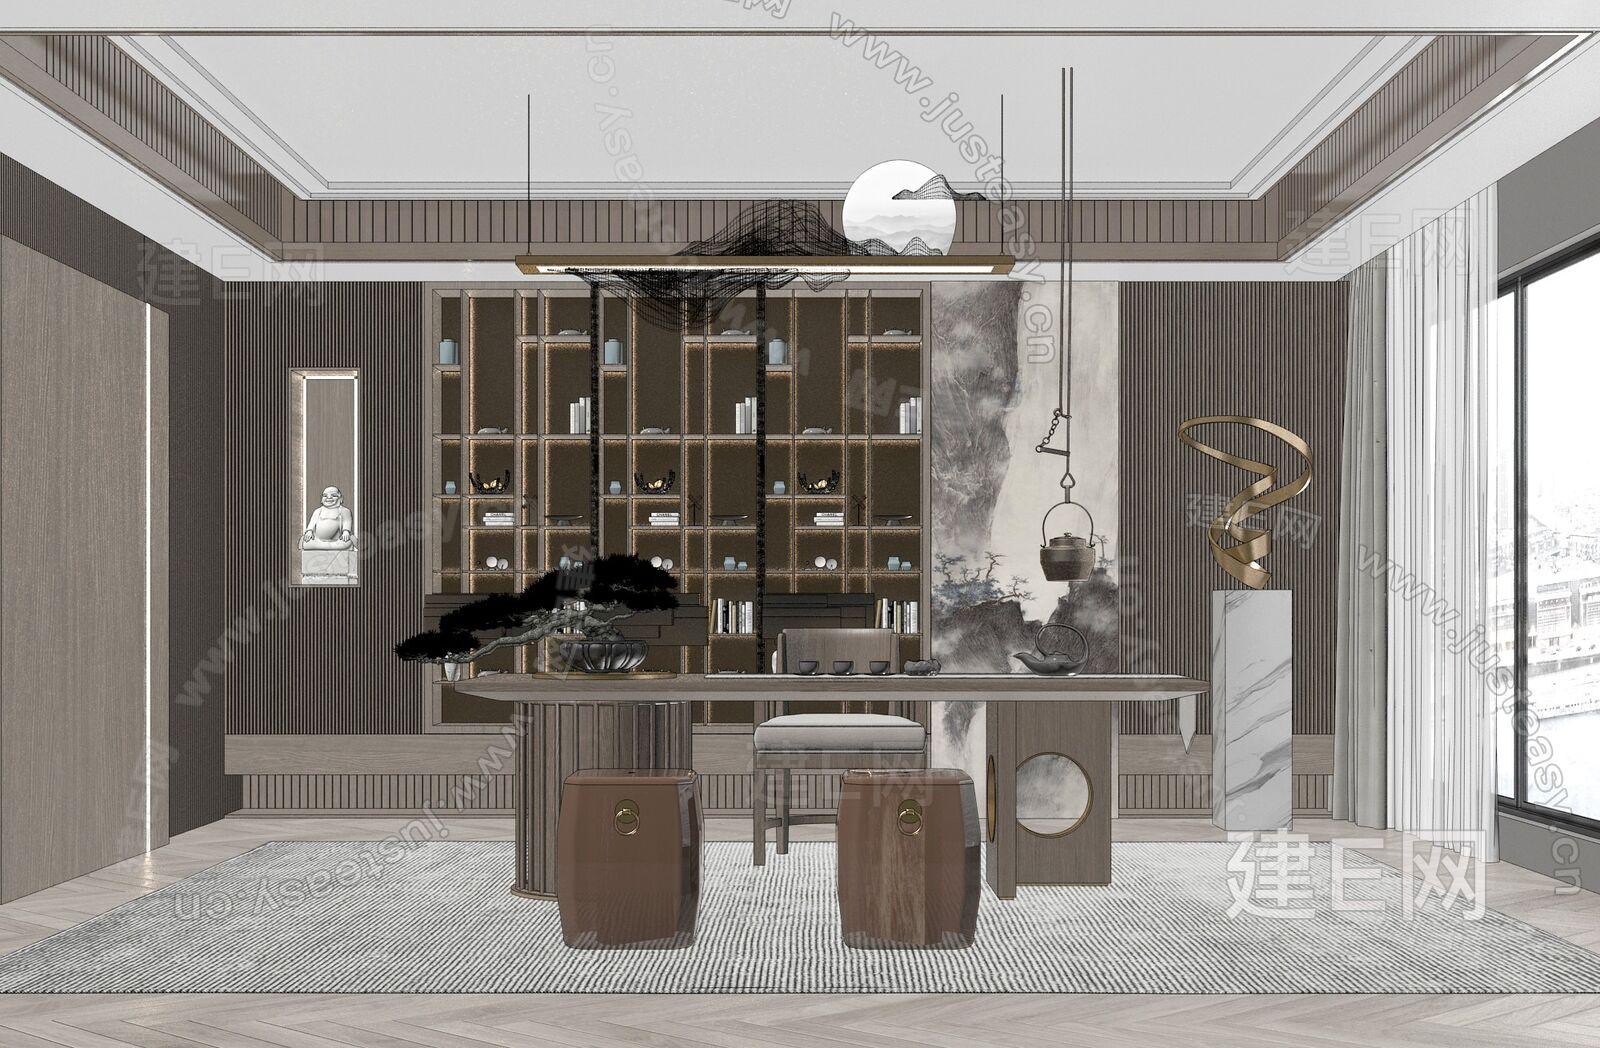 新中式茶室sketchup模型